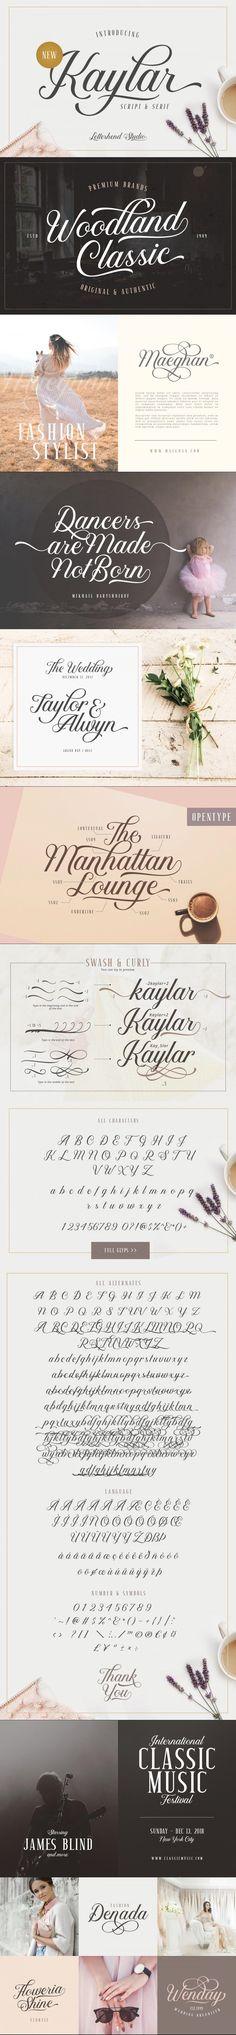 Kaylar - Elegant Script & Serif #casual #beauty #CursiveFont #fontpair #logotype #script #CalligraphicFont #ScriptFont #serif #signature #fontpair #lettering #women #branding #retro #calligraphy #logotype #BestScriptFonts #scriptfont